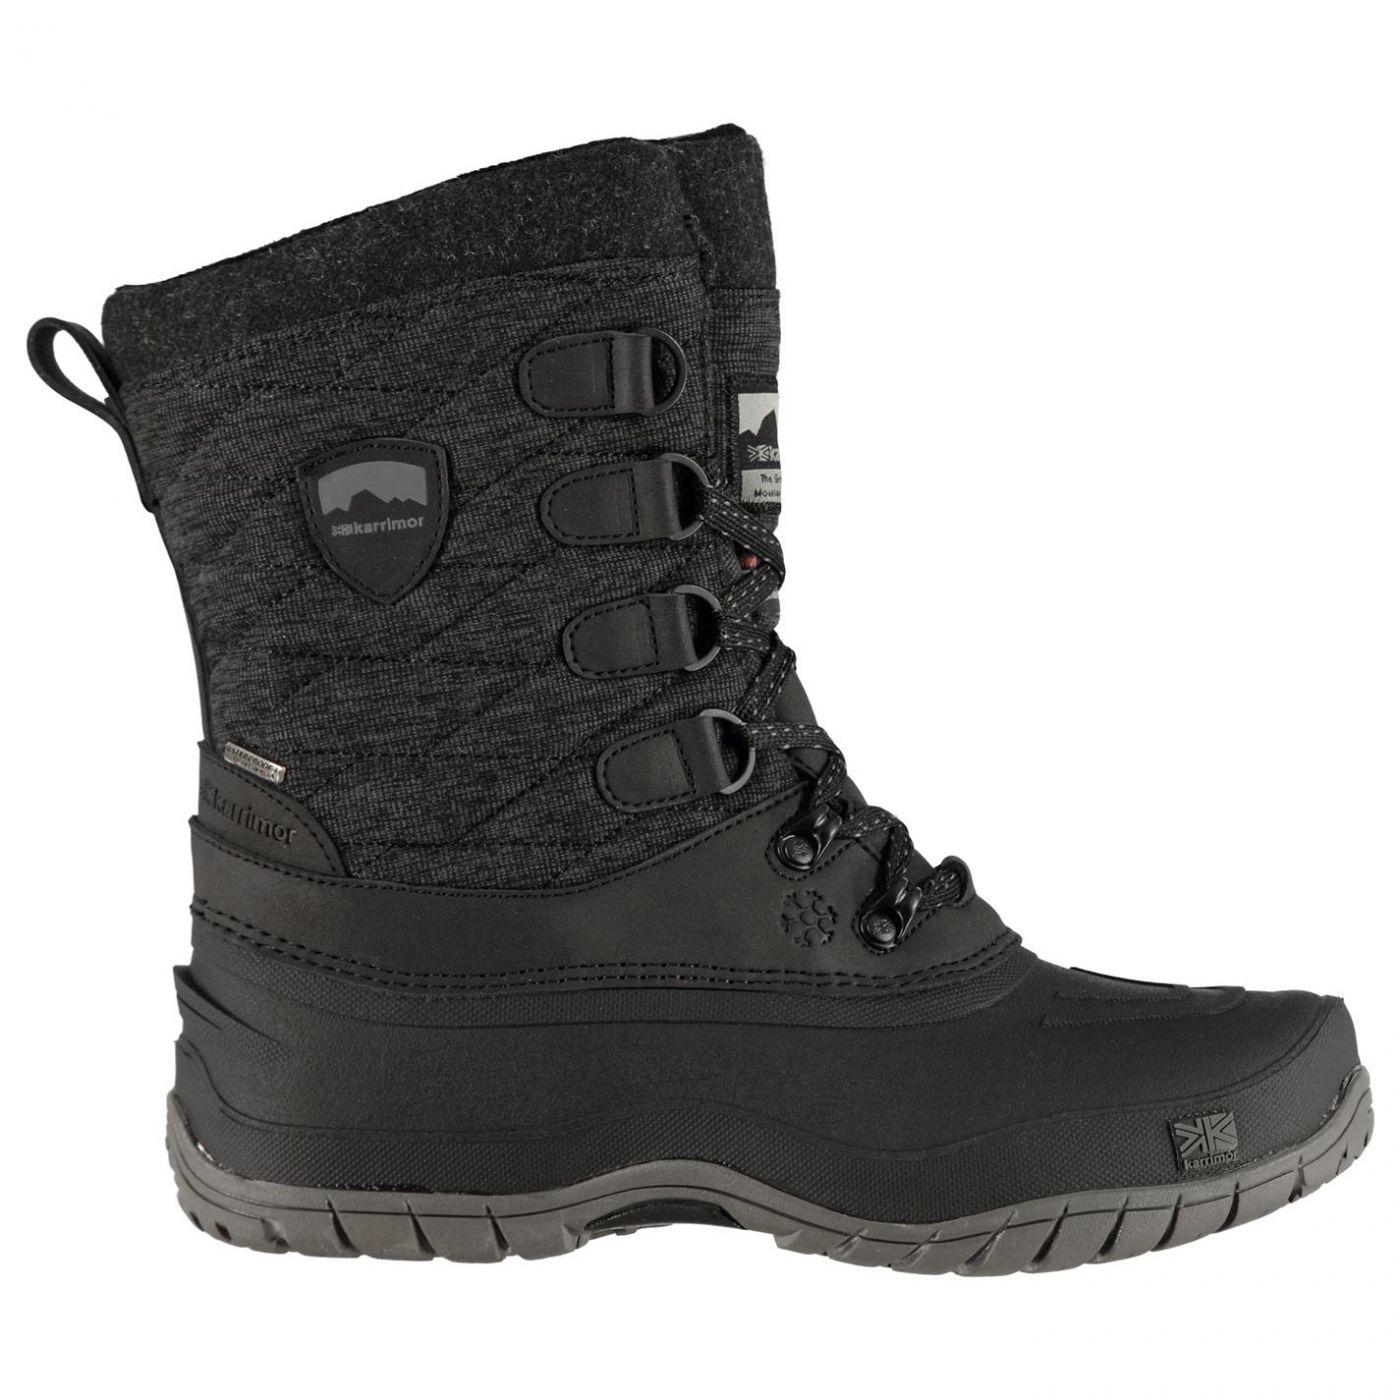 Karrimor Valerie Snowfur 3 Boots Ladies